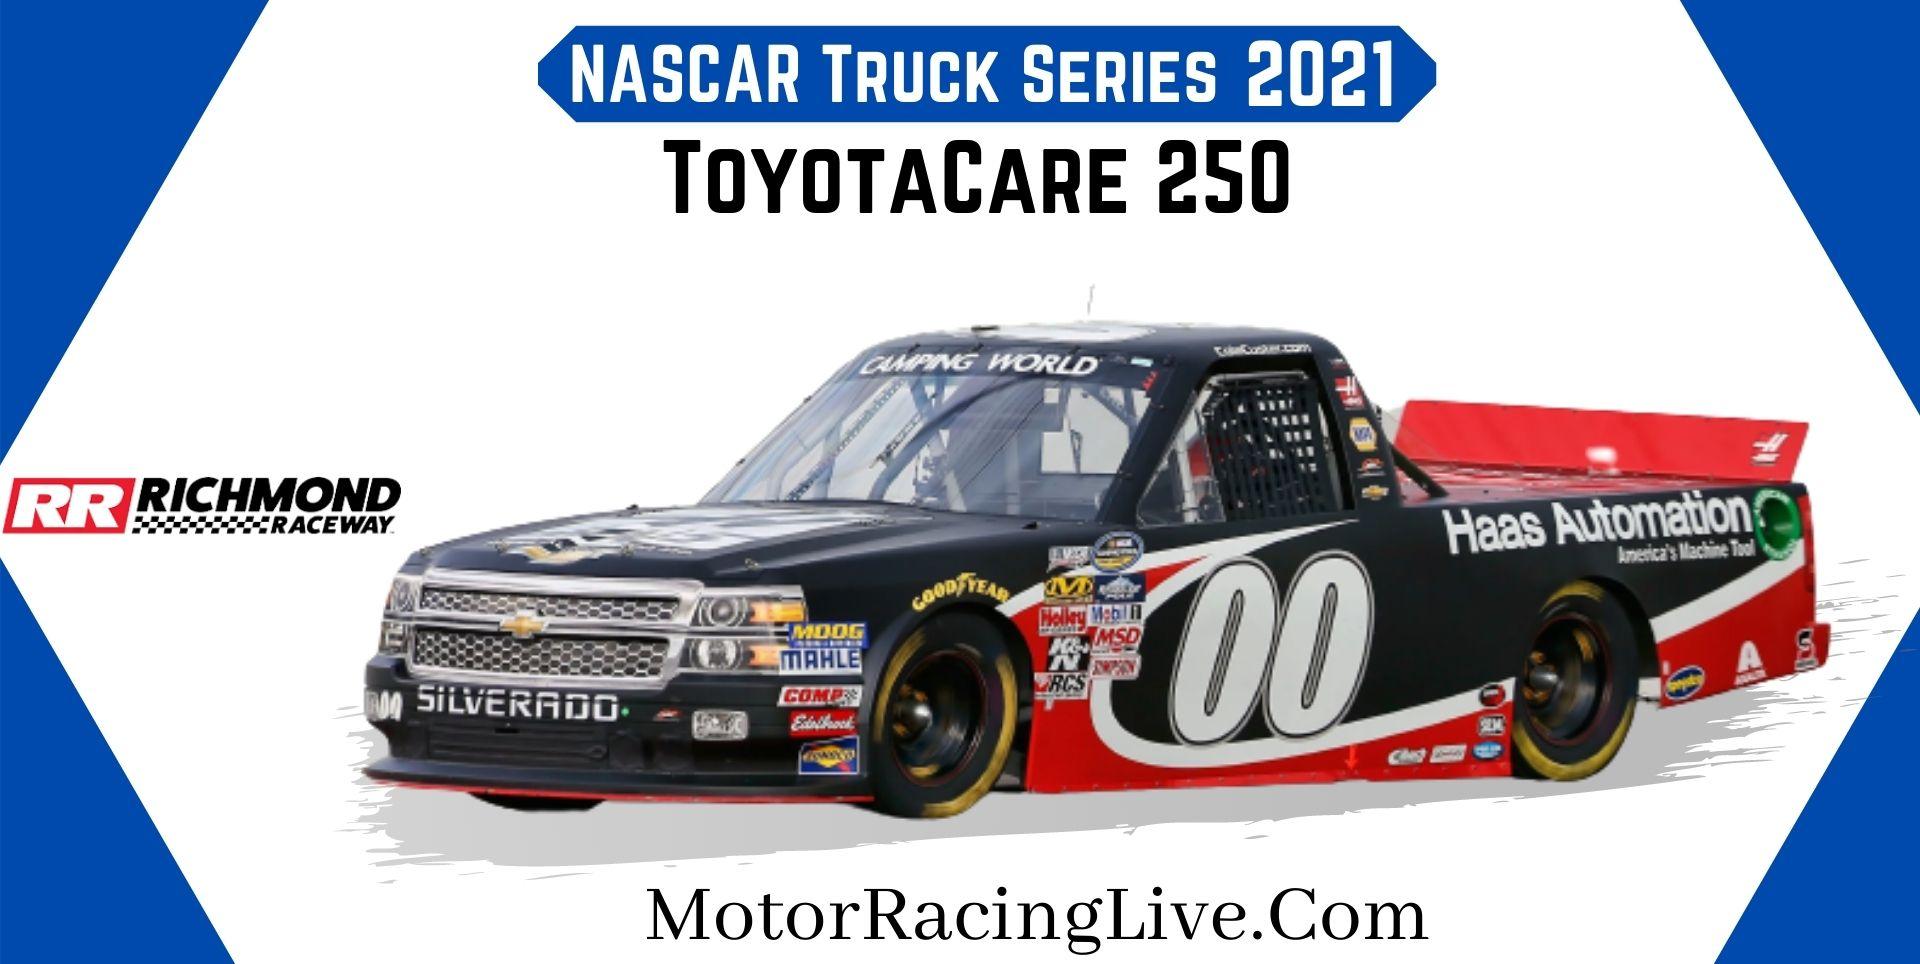 ToyotaCare 250 Nascar Truck 2021 Live Stream